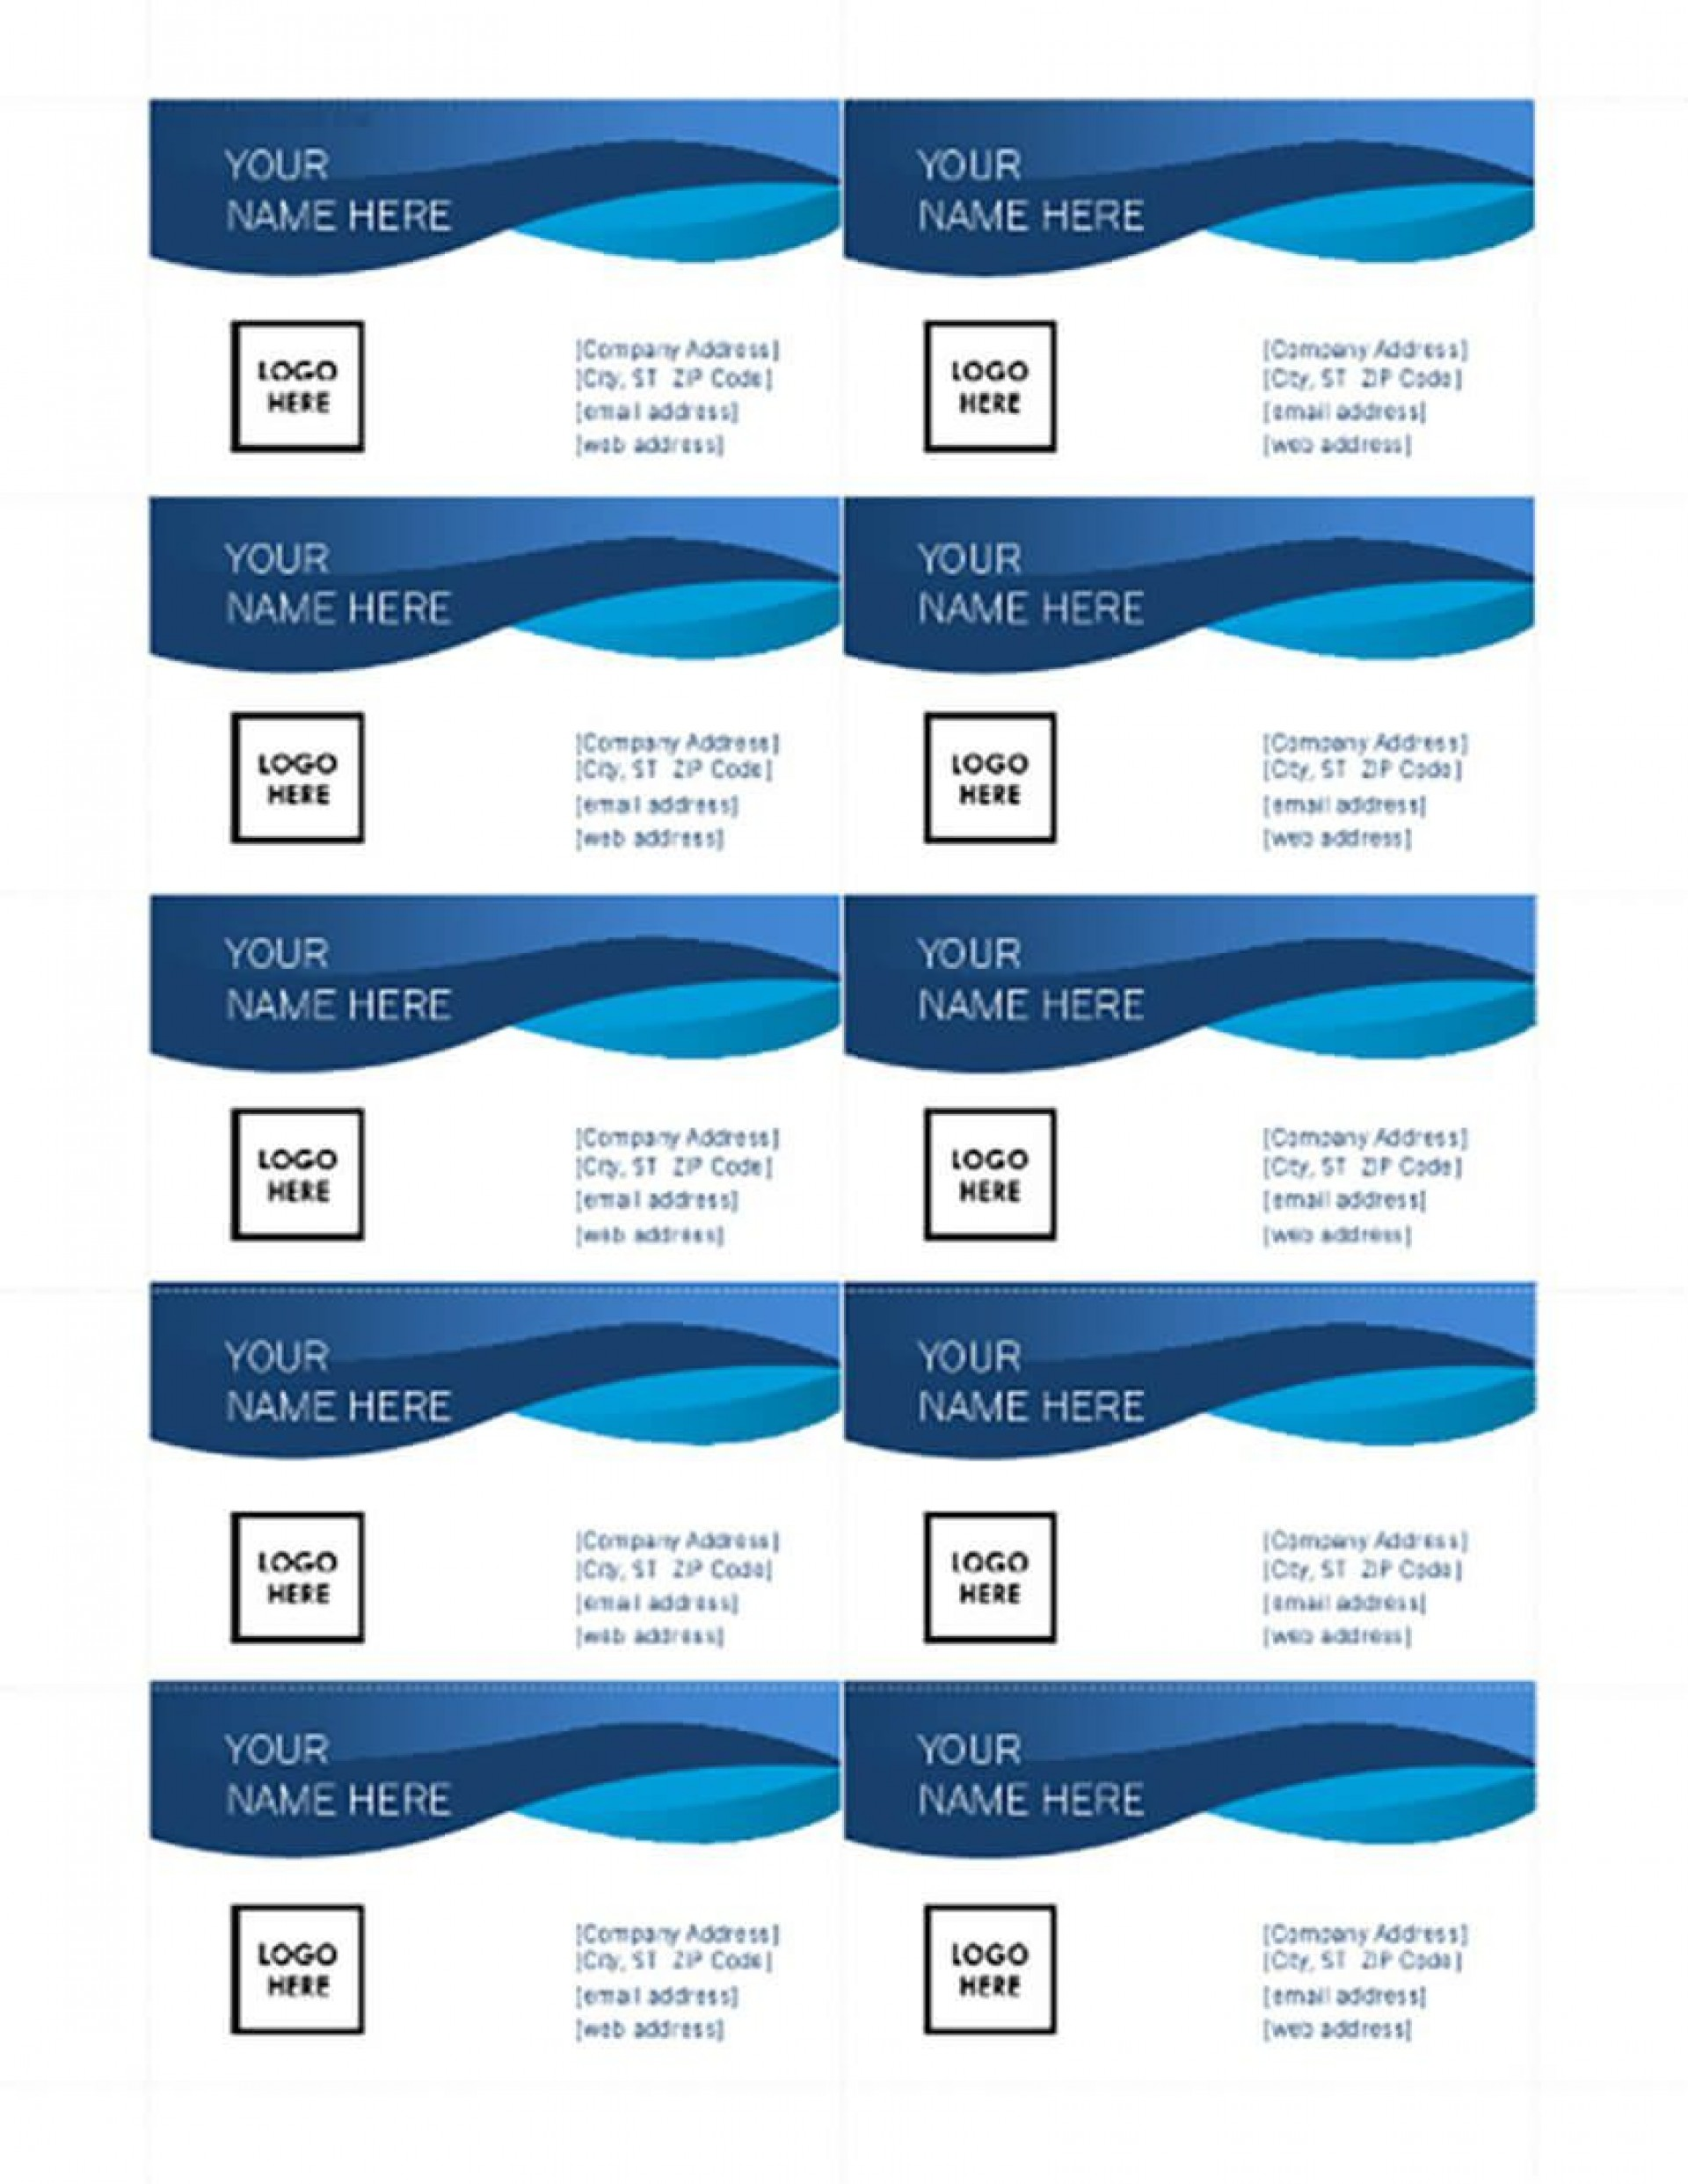 003 Sensational Free Printable Card Template Word Design  Blank Busines For1920